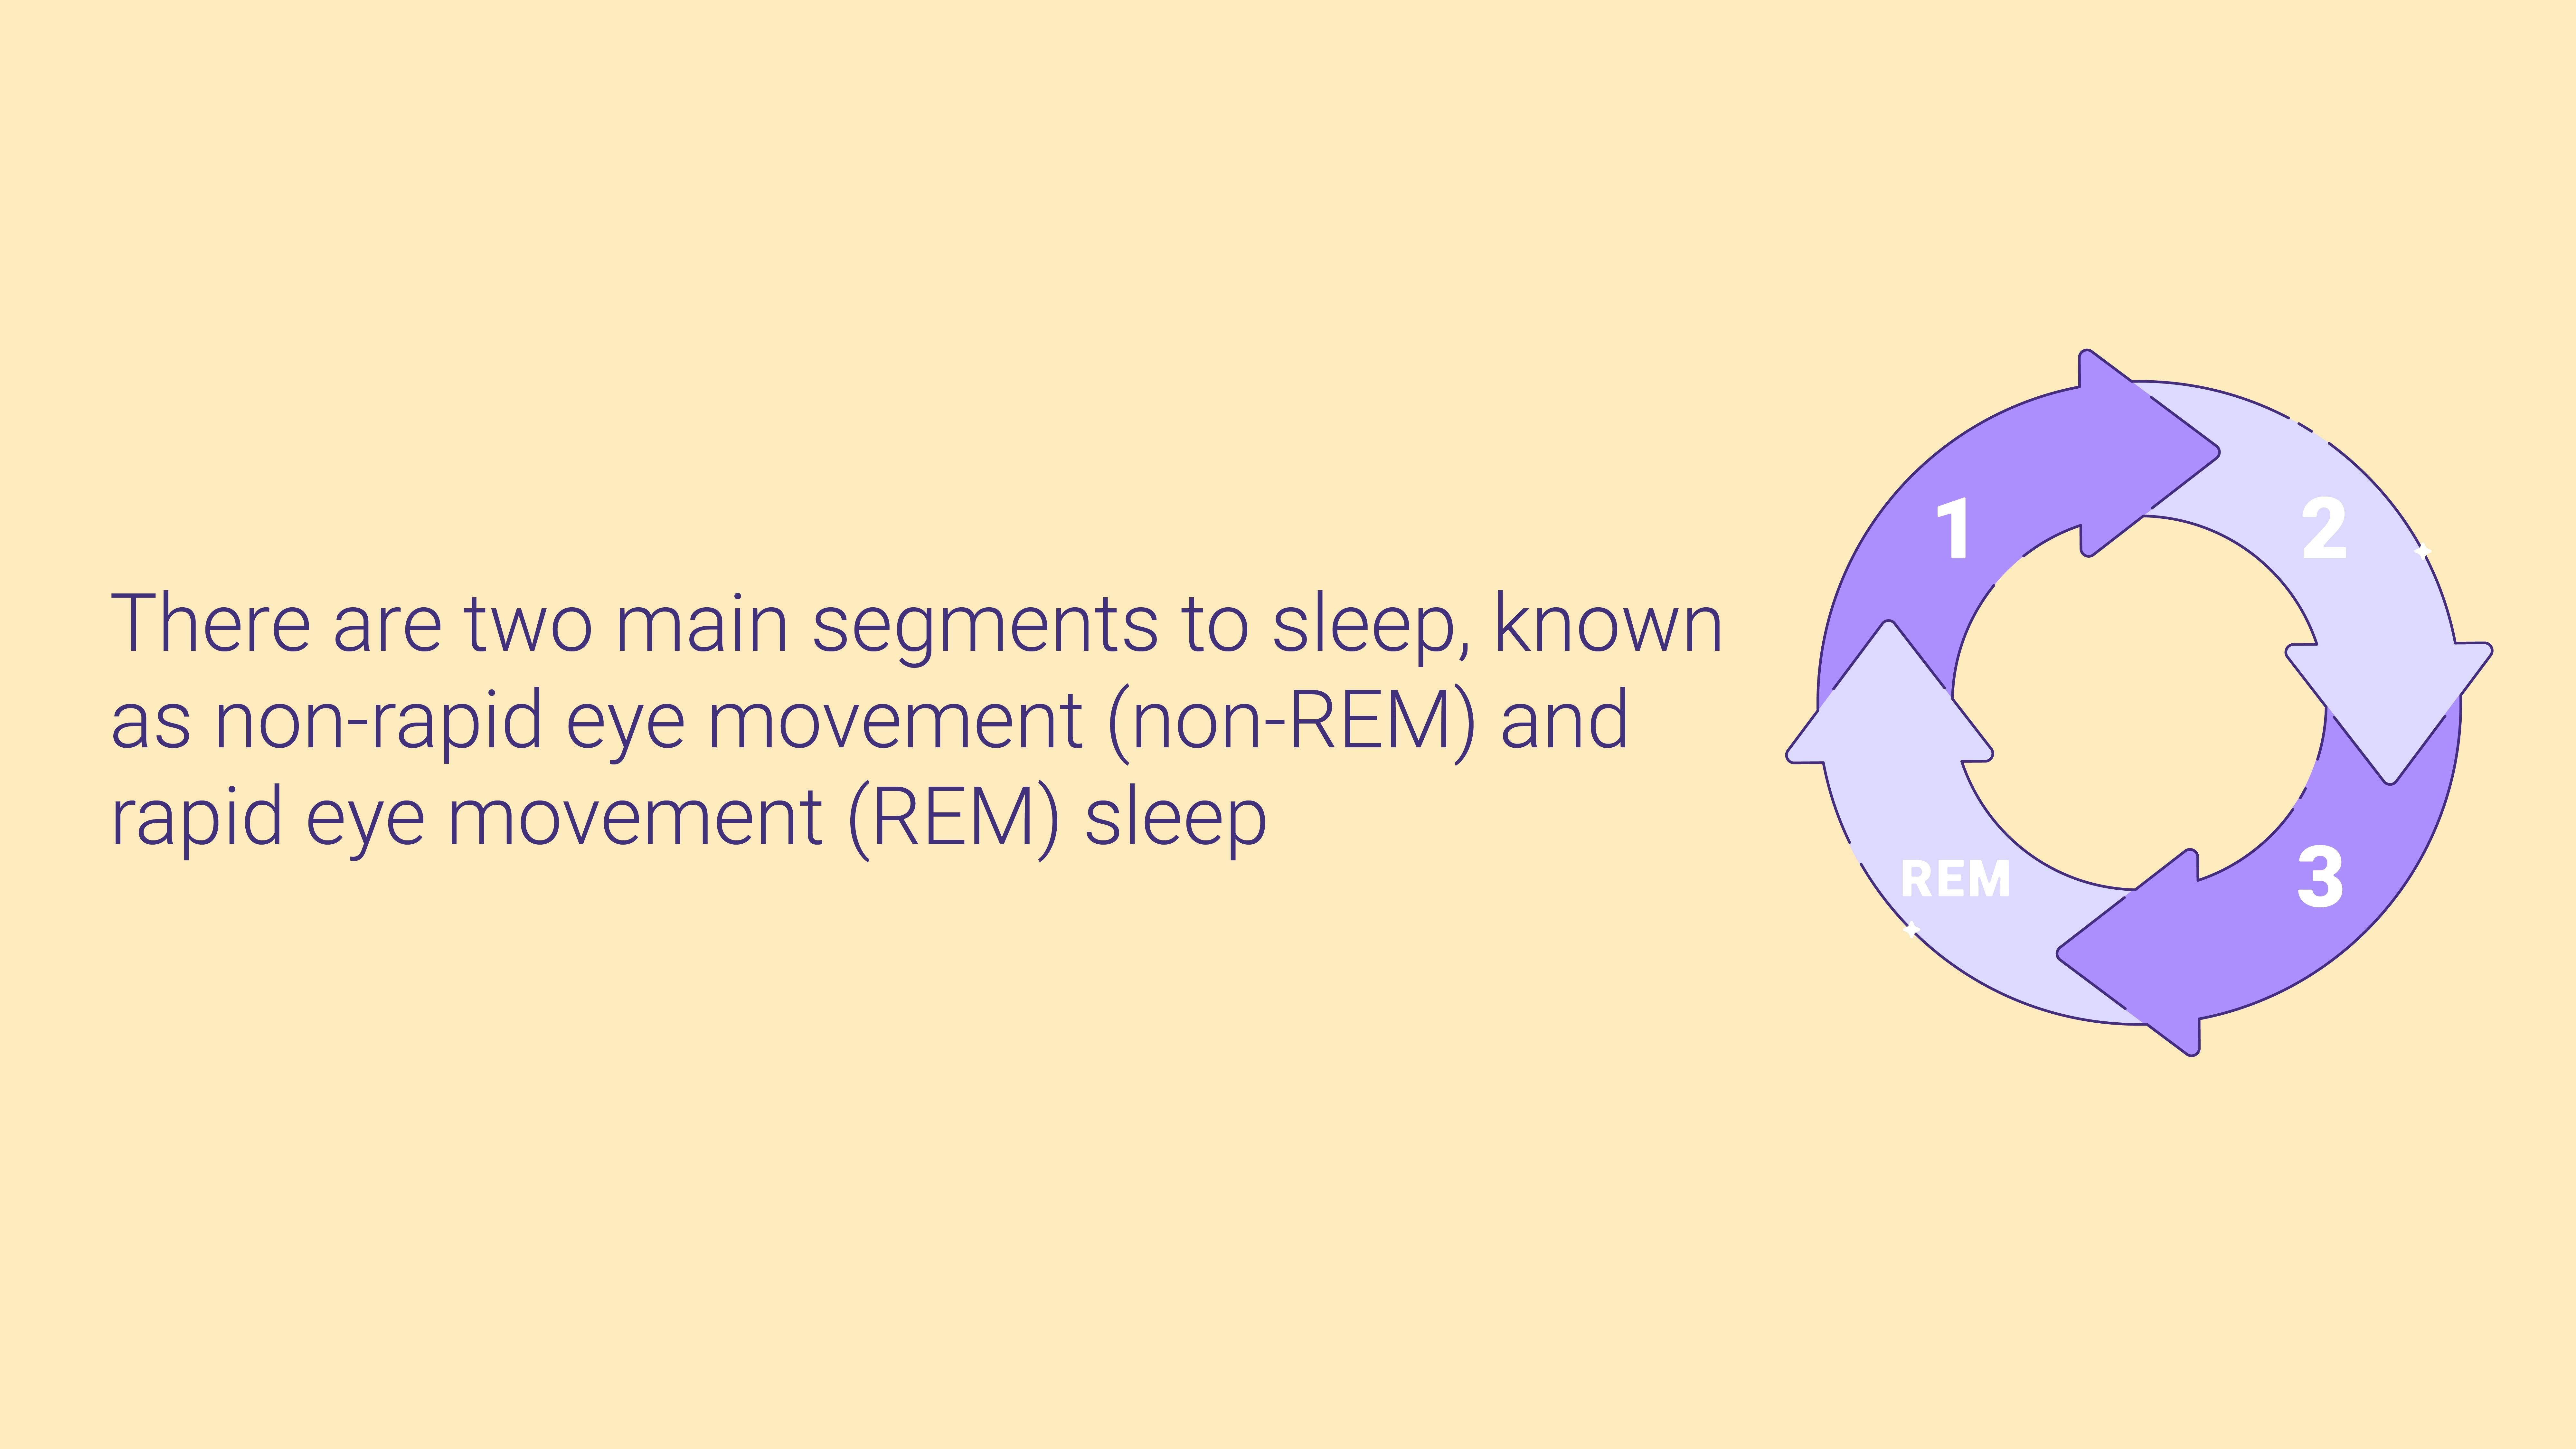 light-sleepers-vs-heavy-sleepers